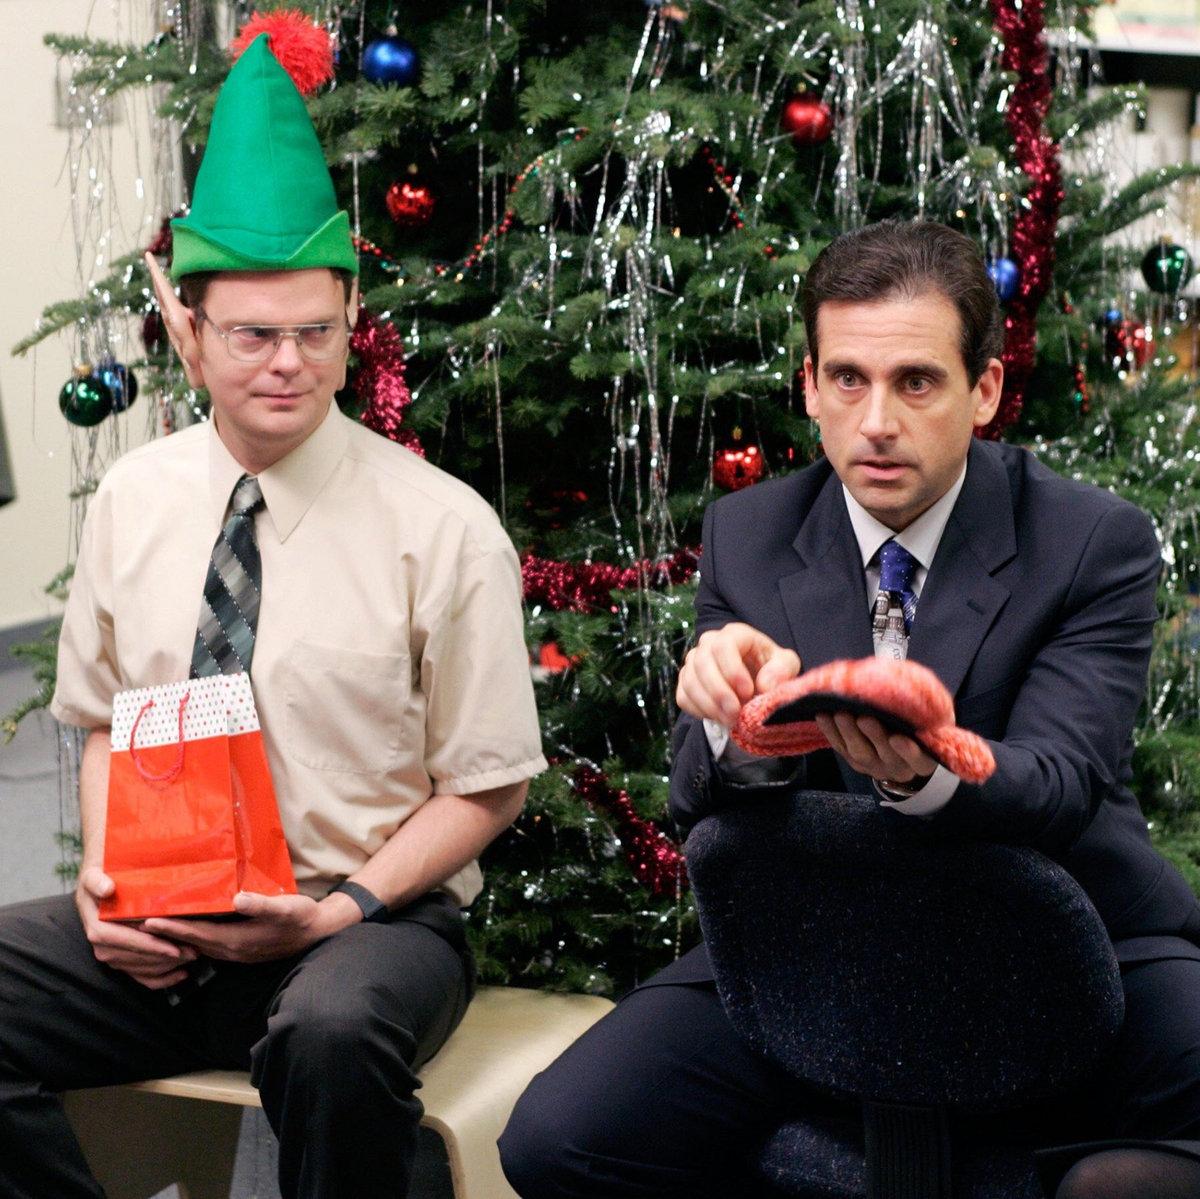 Weezer Christmas.The Christmas Song Weezer Ferret Bueller